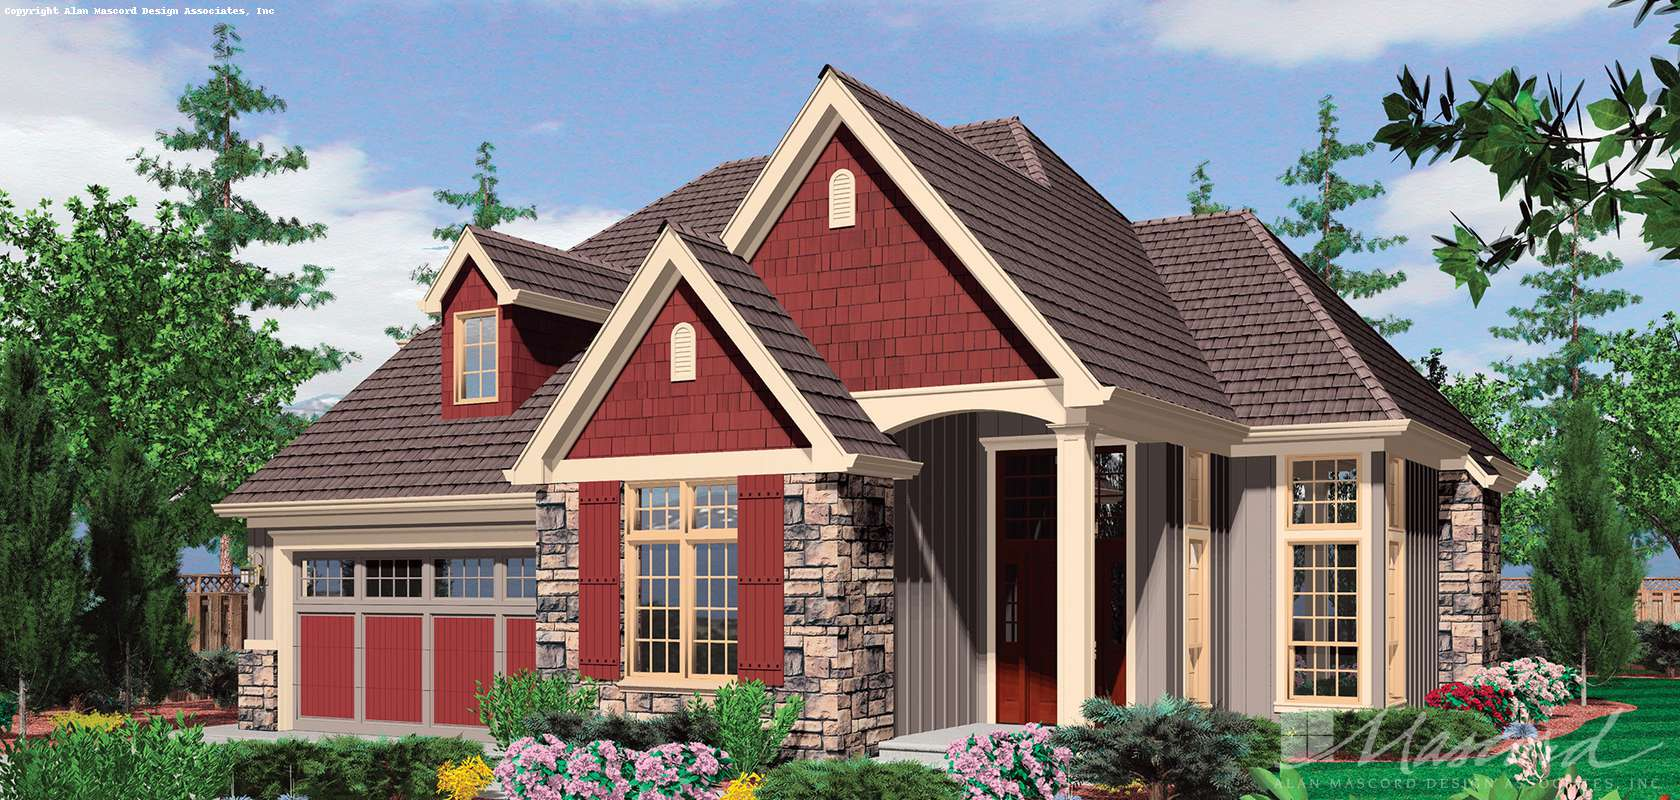 Mascord House Plan B22148: The Sentinel